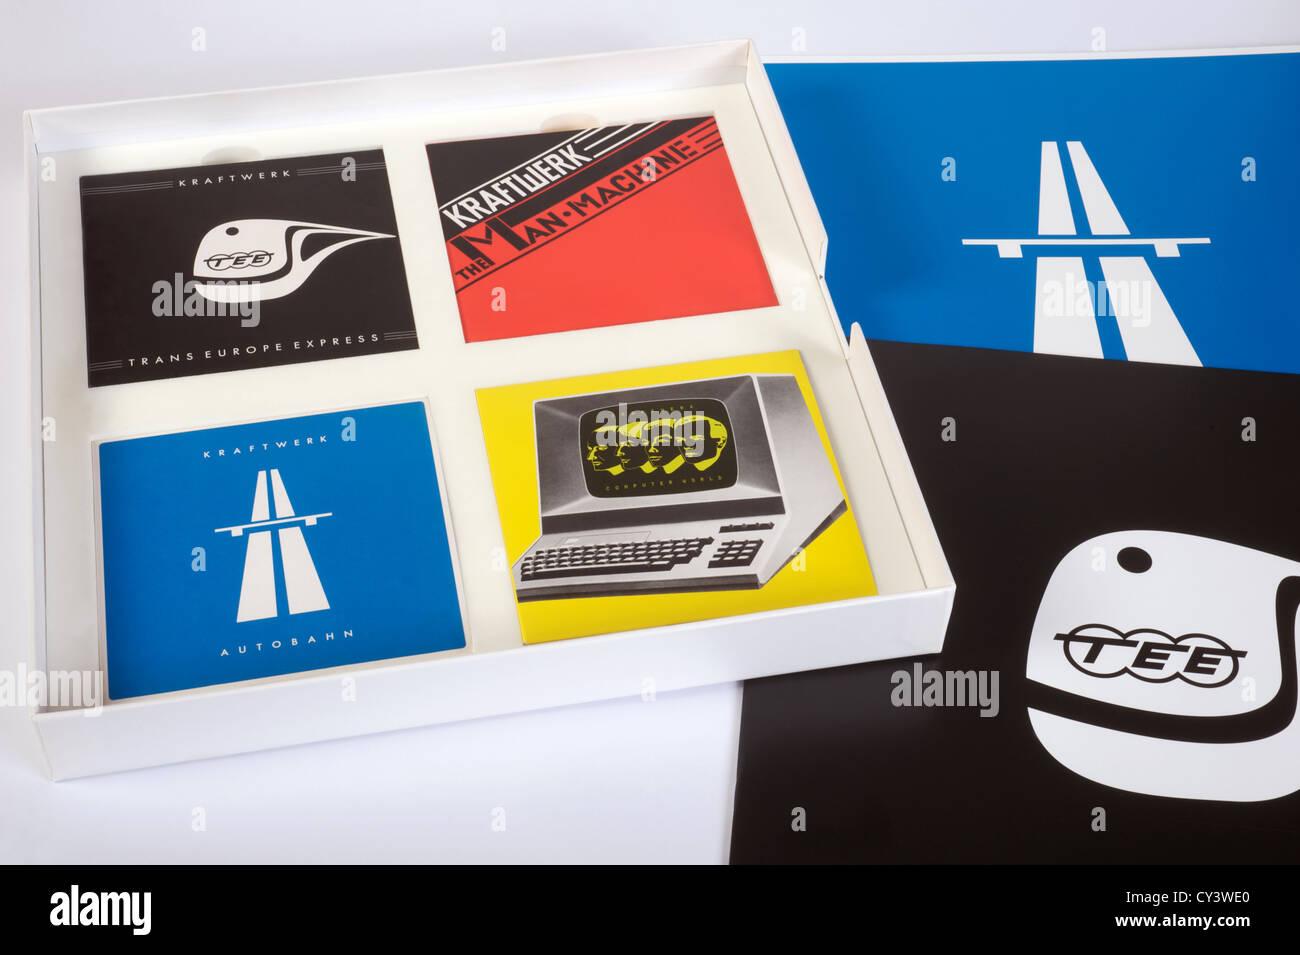 Kraftwerk The Catalalogue box set CD's Stock Photo